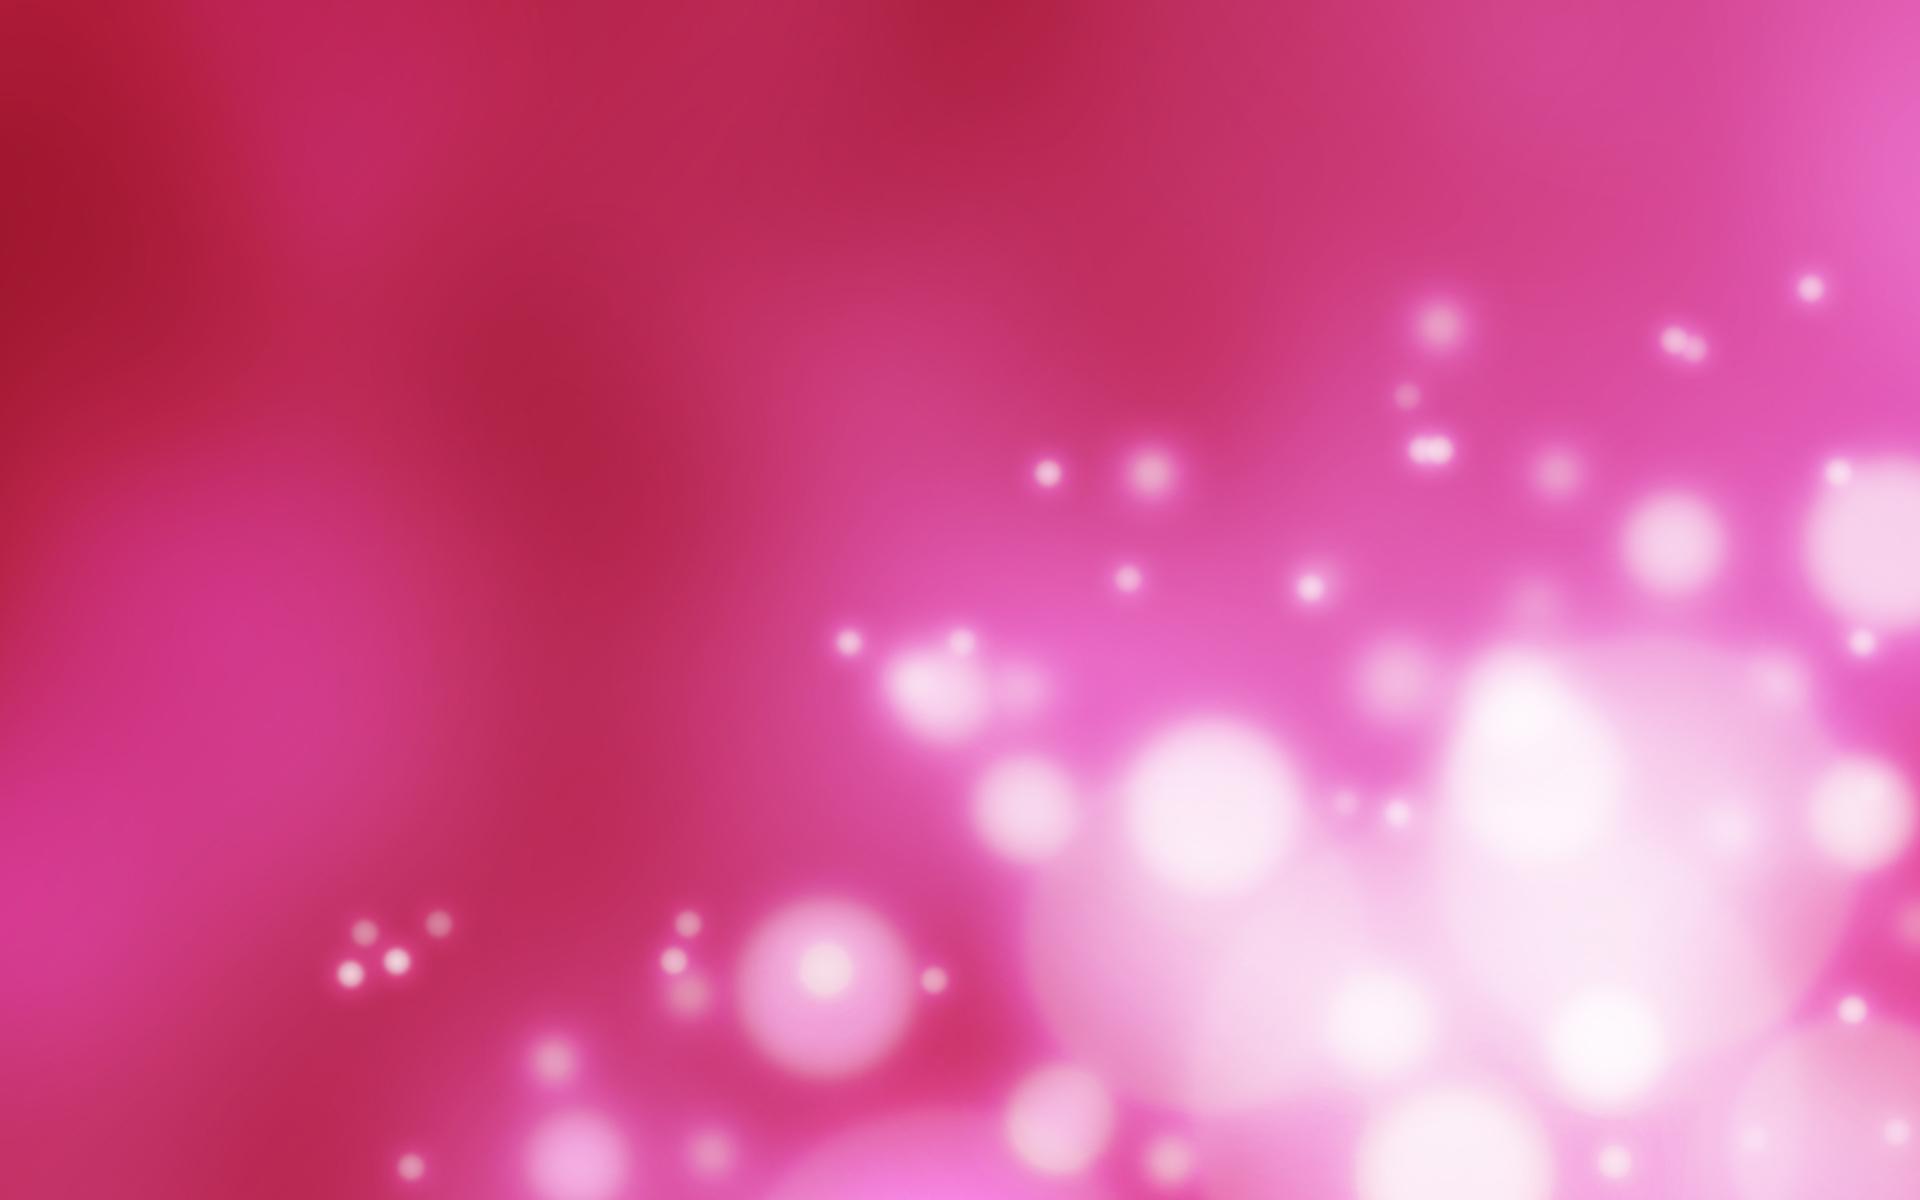 pink colour hd wallpaper free download